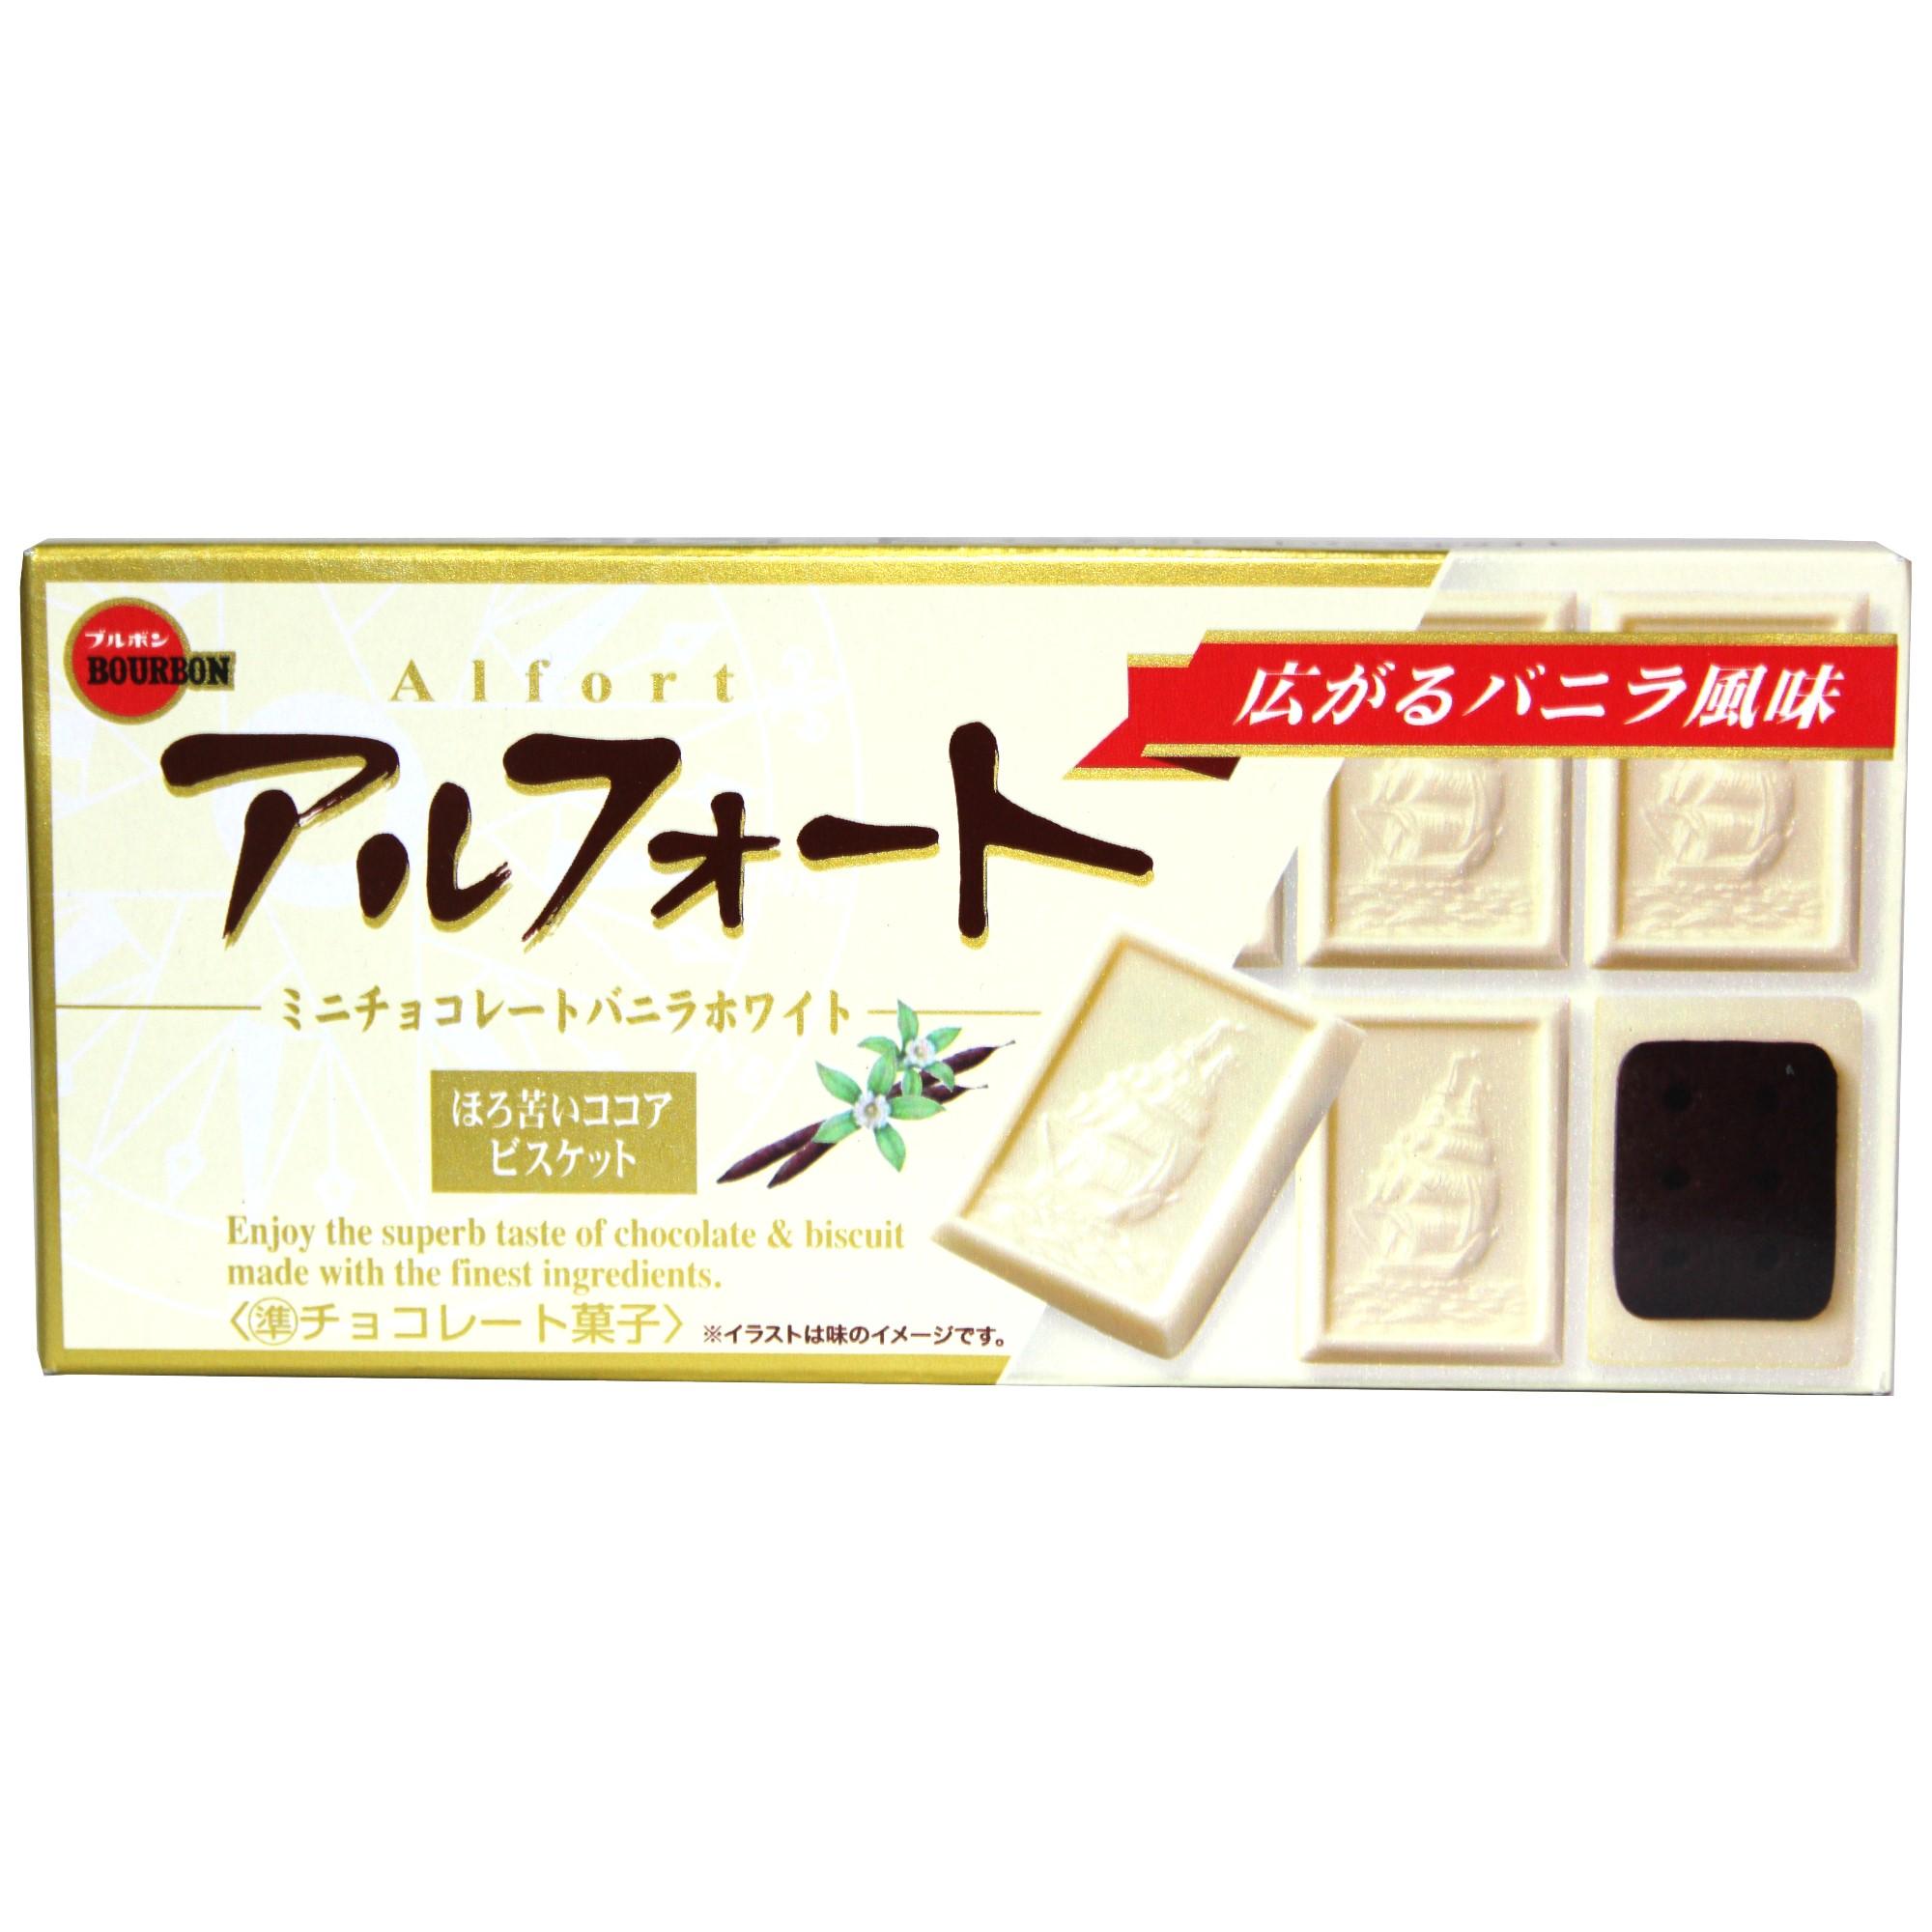 Bourbon 北日本 Alfort 船型香草白巧克力餅 55g